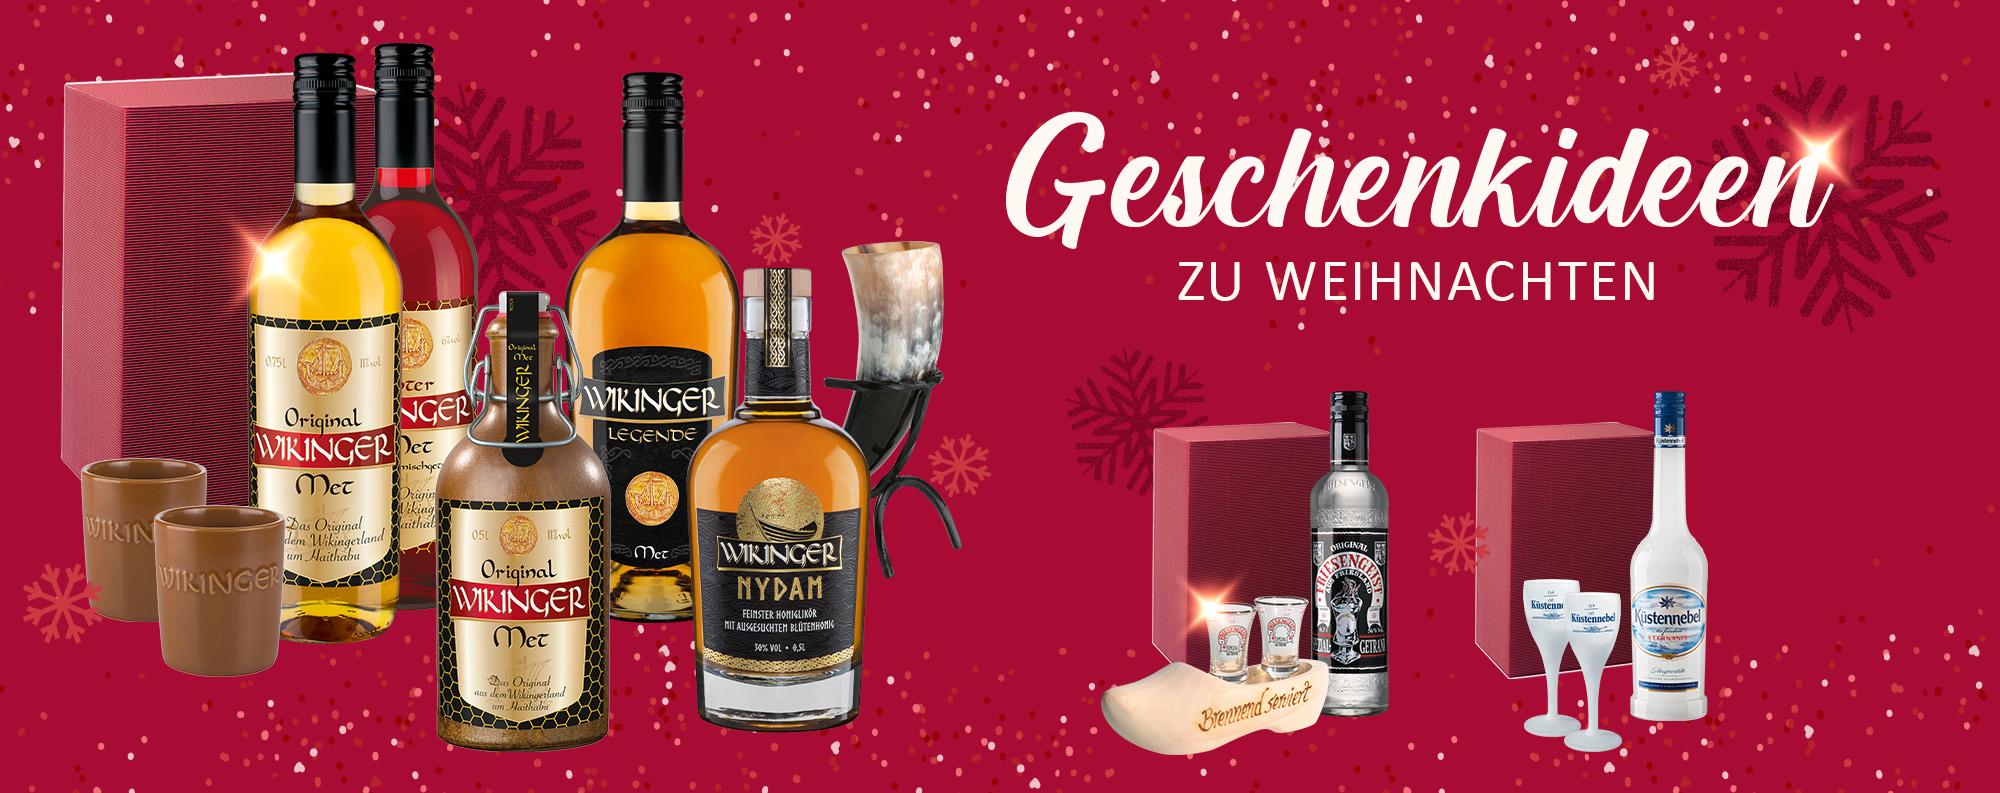 be_shop_banner_geschenkbox_xmas_2000x793_09-2021